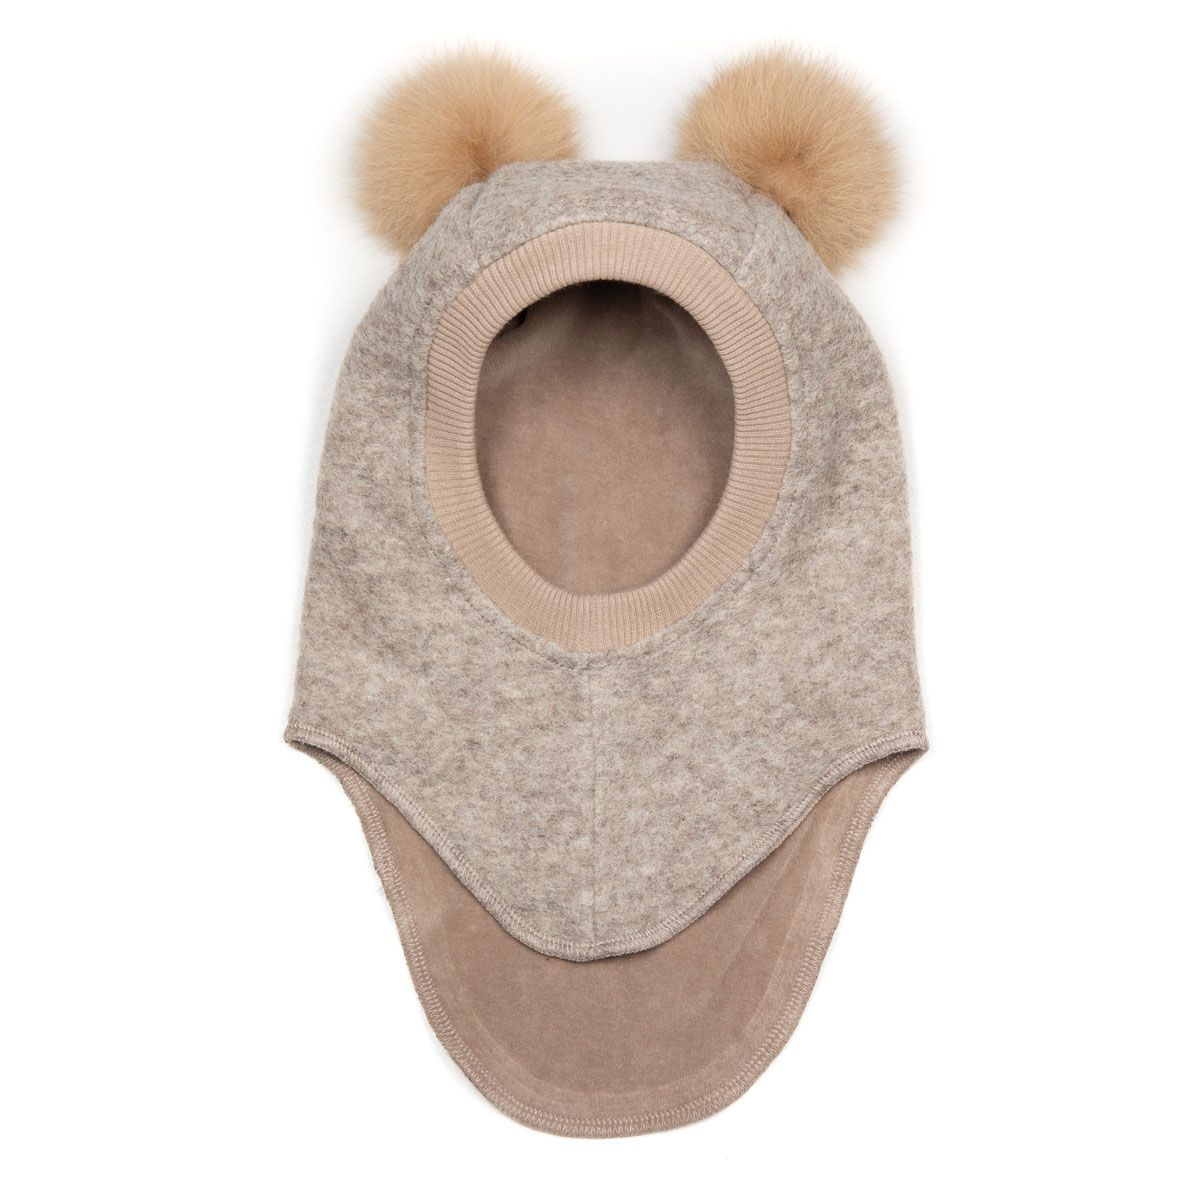 Huttelihut BIG BEAR E-hut Wool Camel/Camel